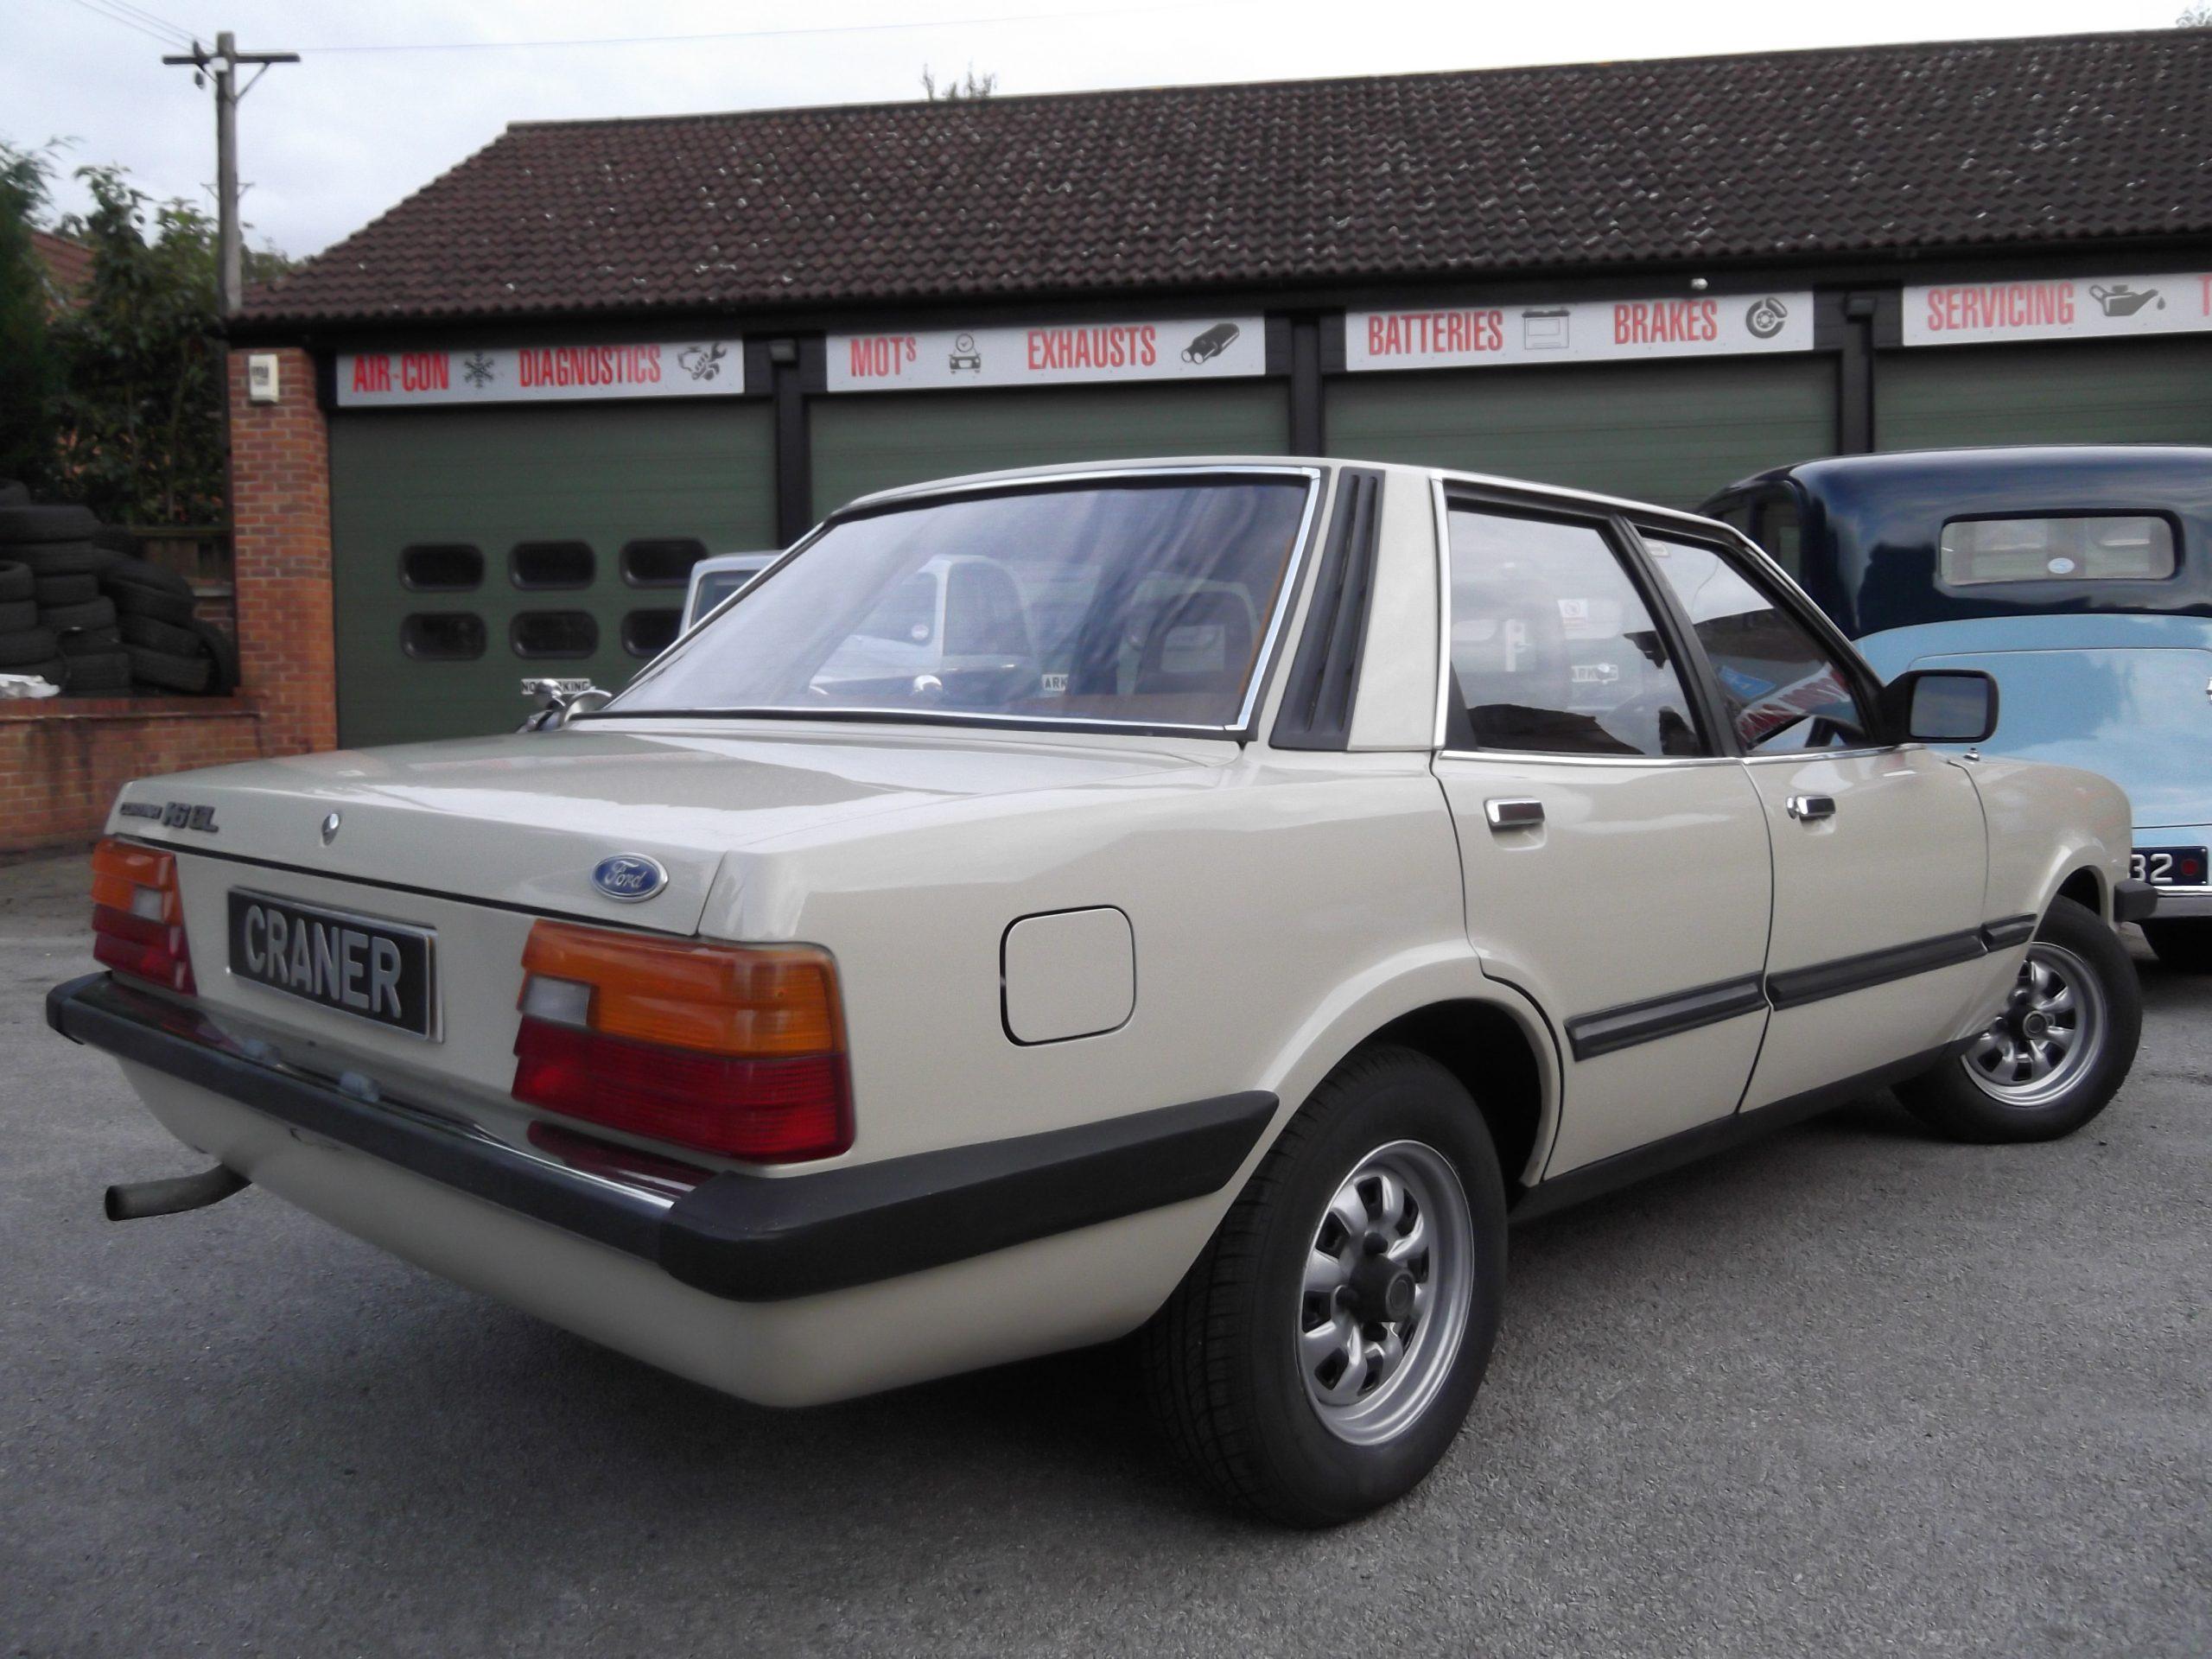 ford-cortina-gl-craner-classic-cars-11